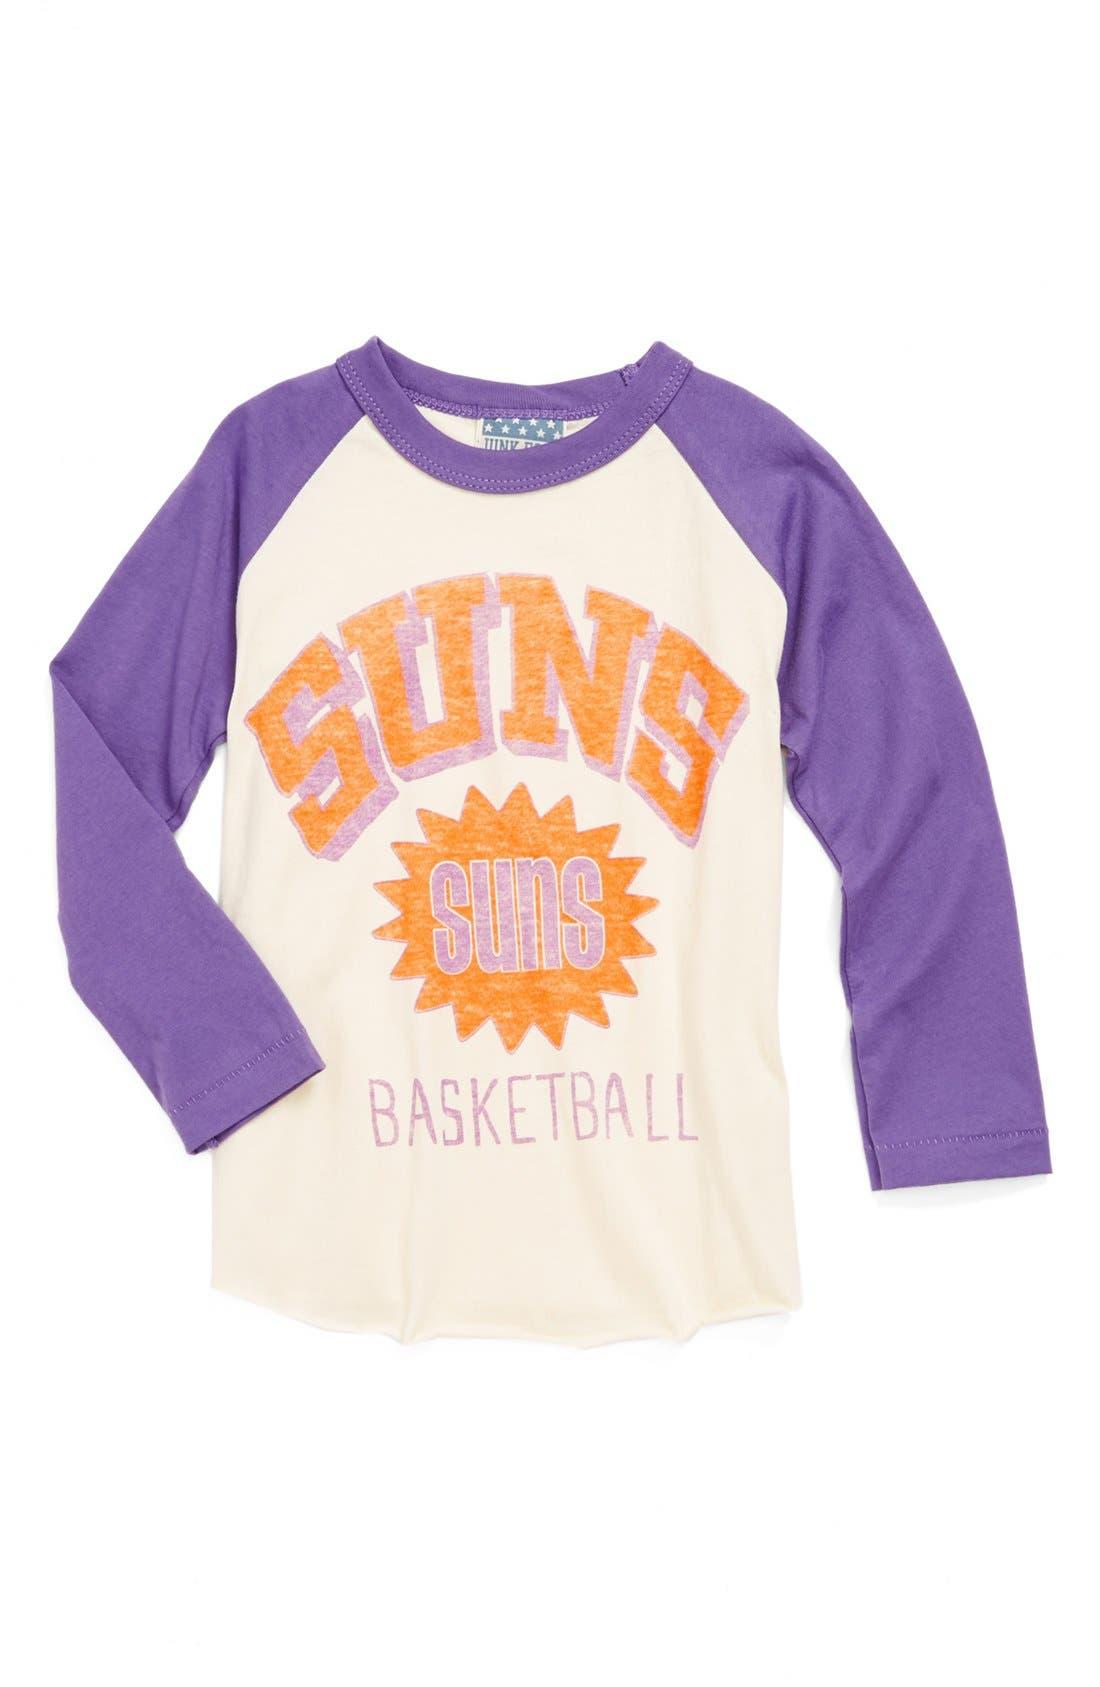 Main Image - Junk Food 'Phoenix Suns' Long Sleeve T-Shirt (Toddler Boys)